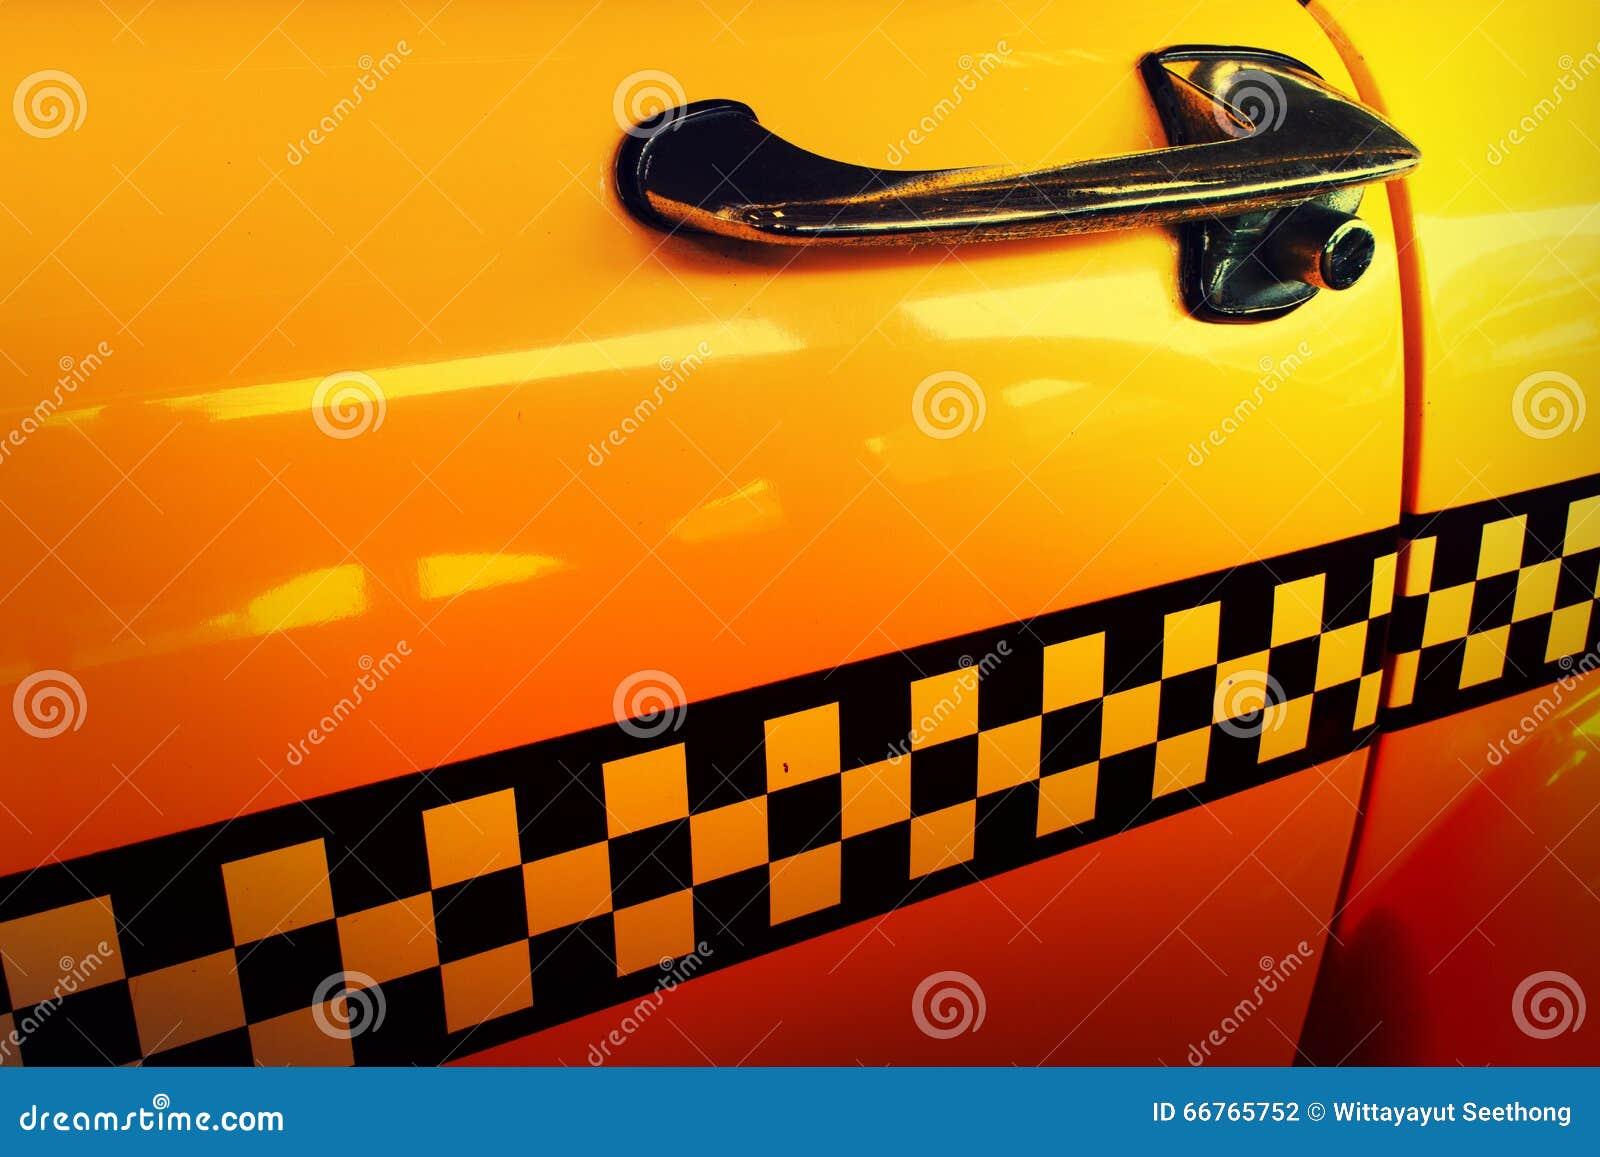 Gelbes Fahrerhaus-Taxi, Tür des Taxis mit Kontrolleur